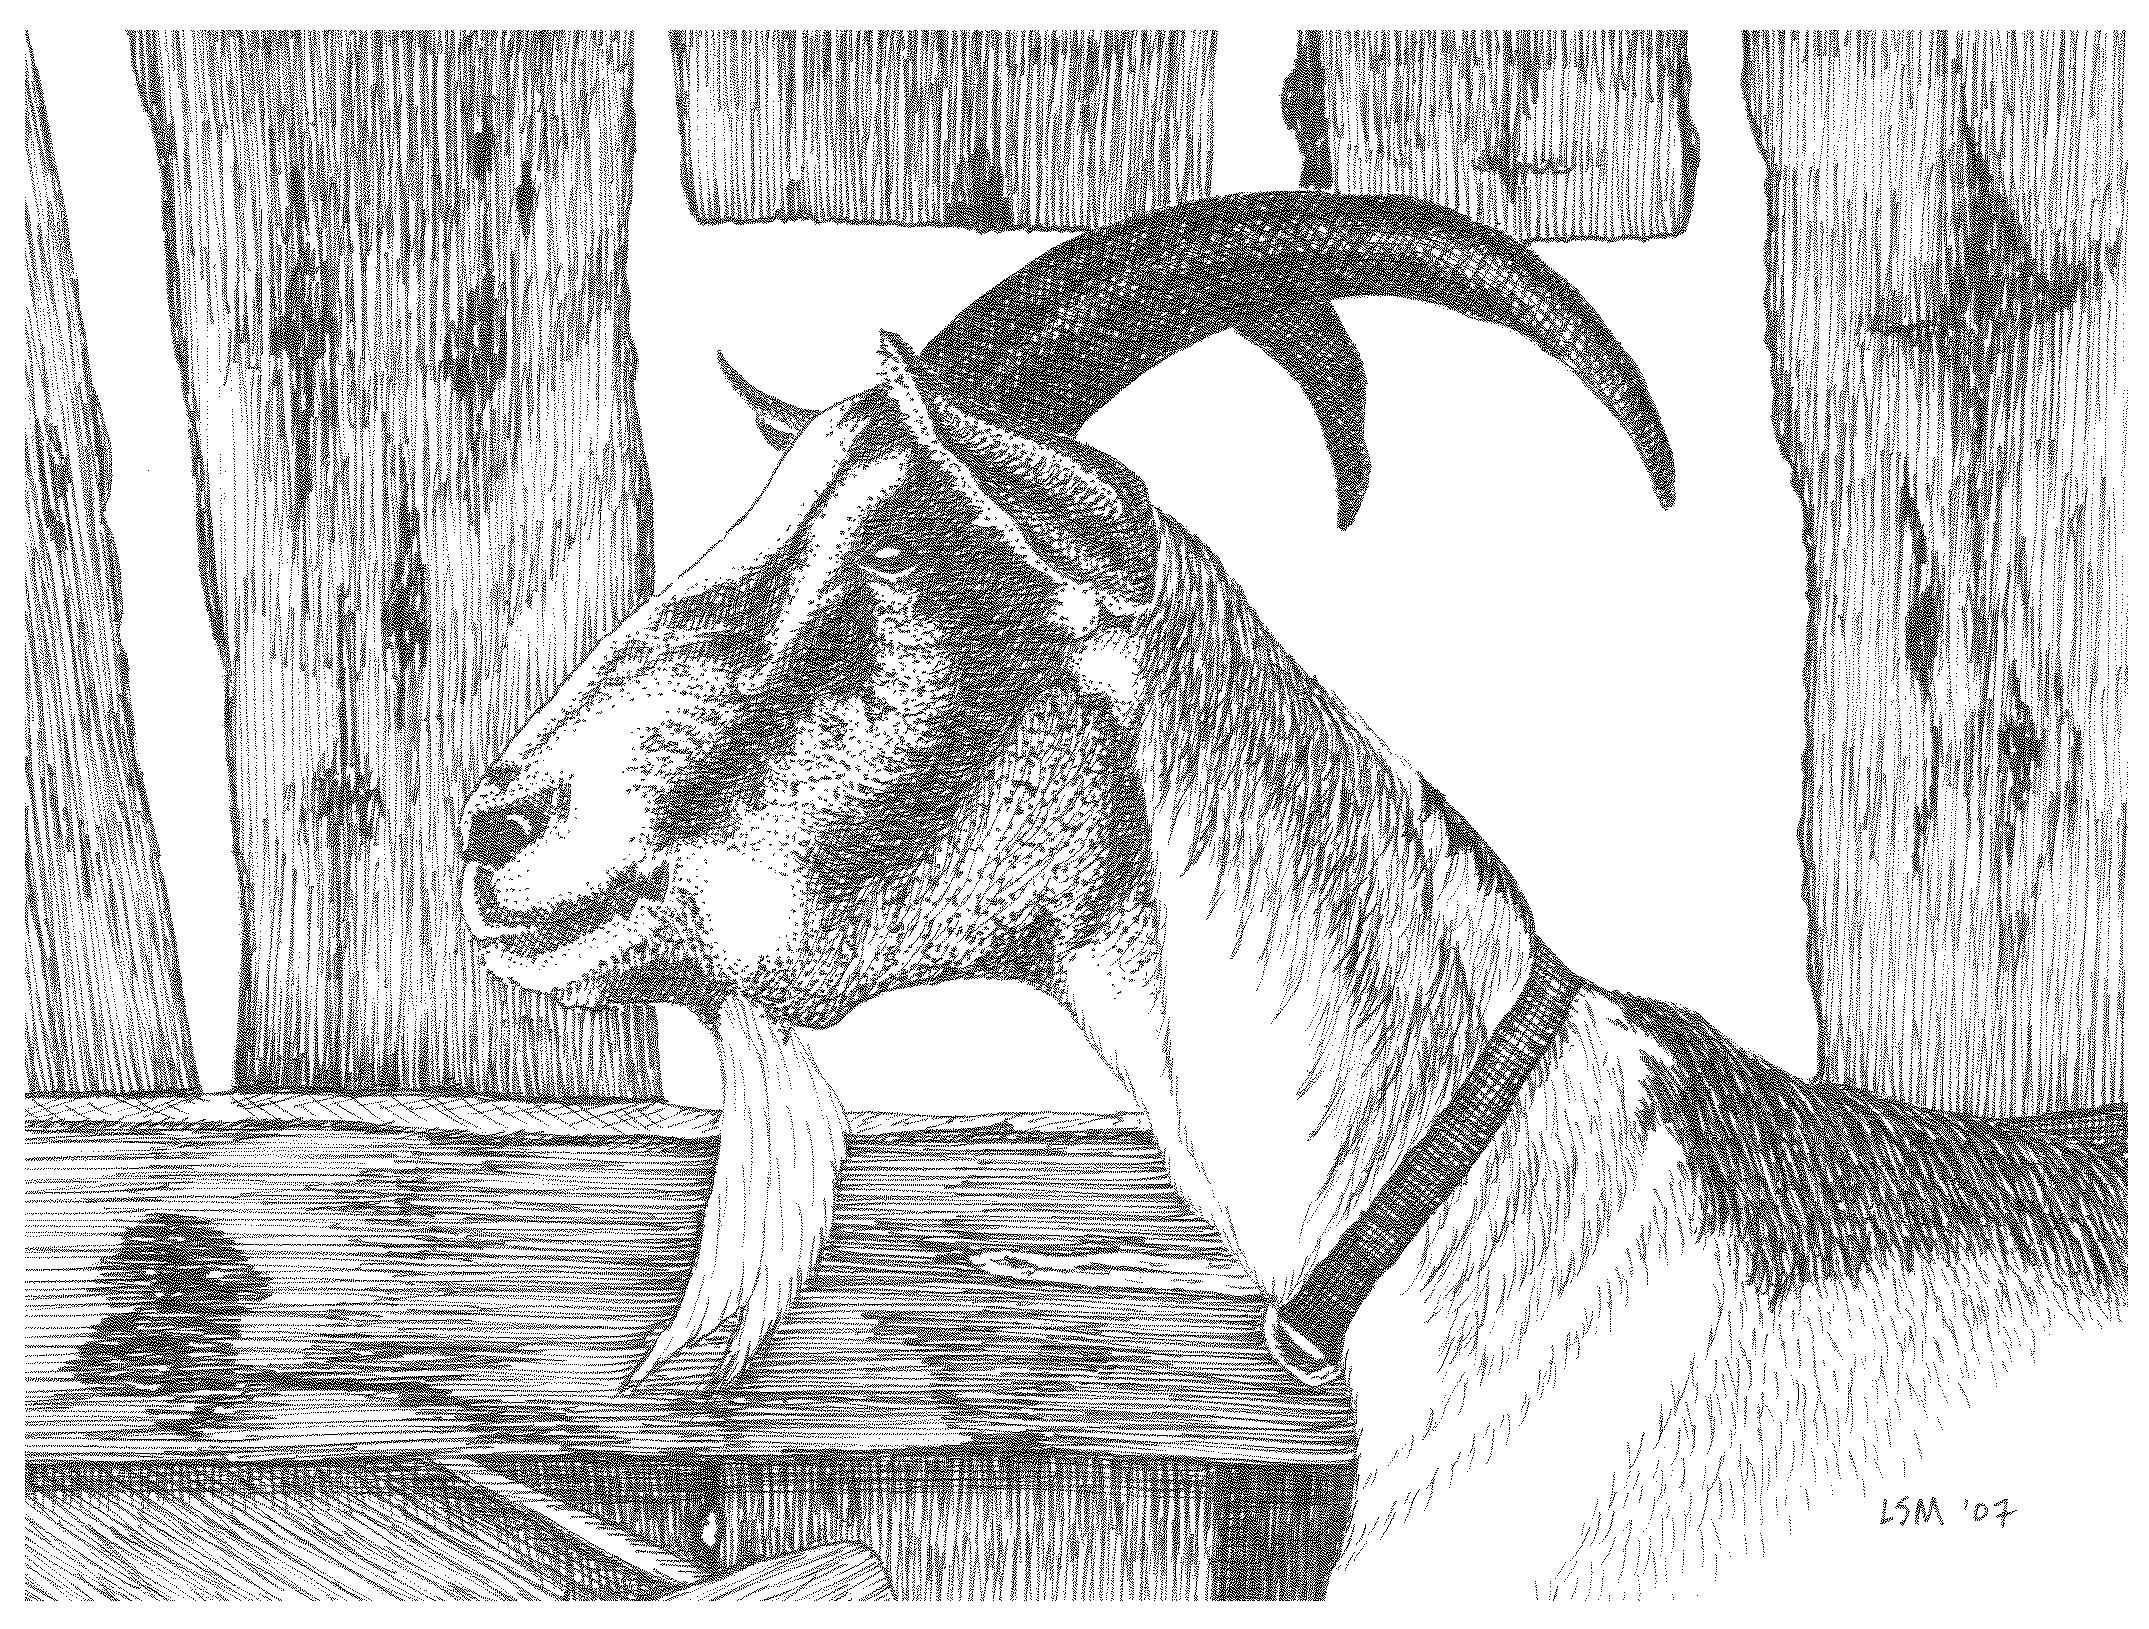 Billie Goat Gruff